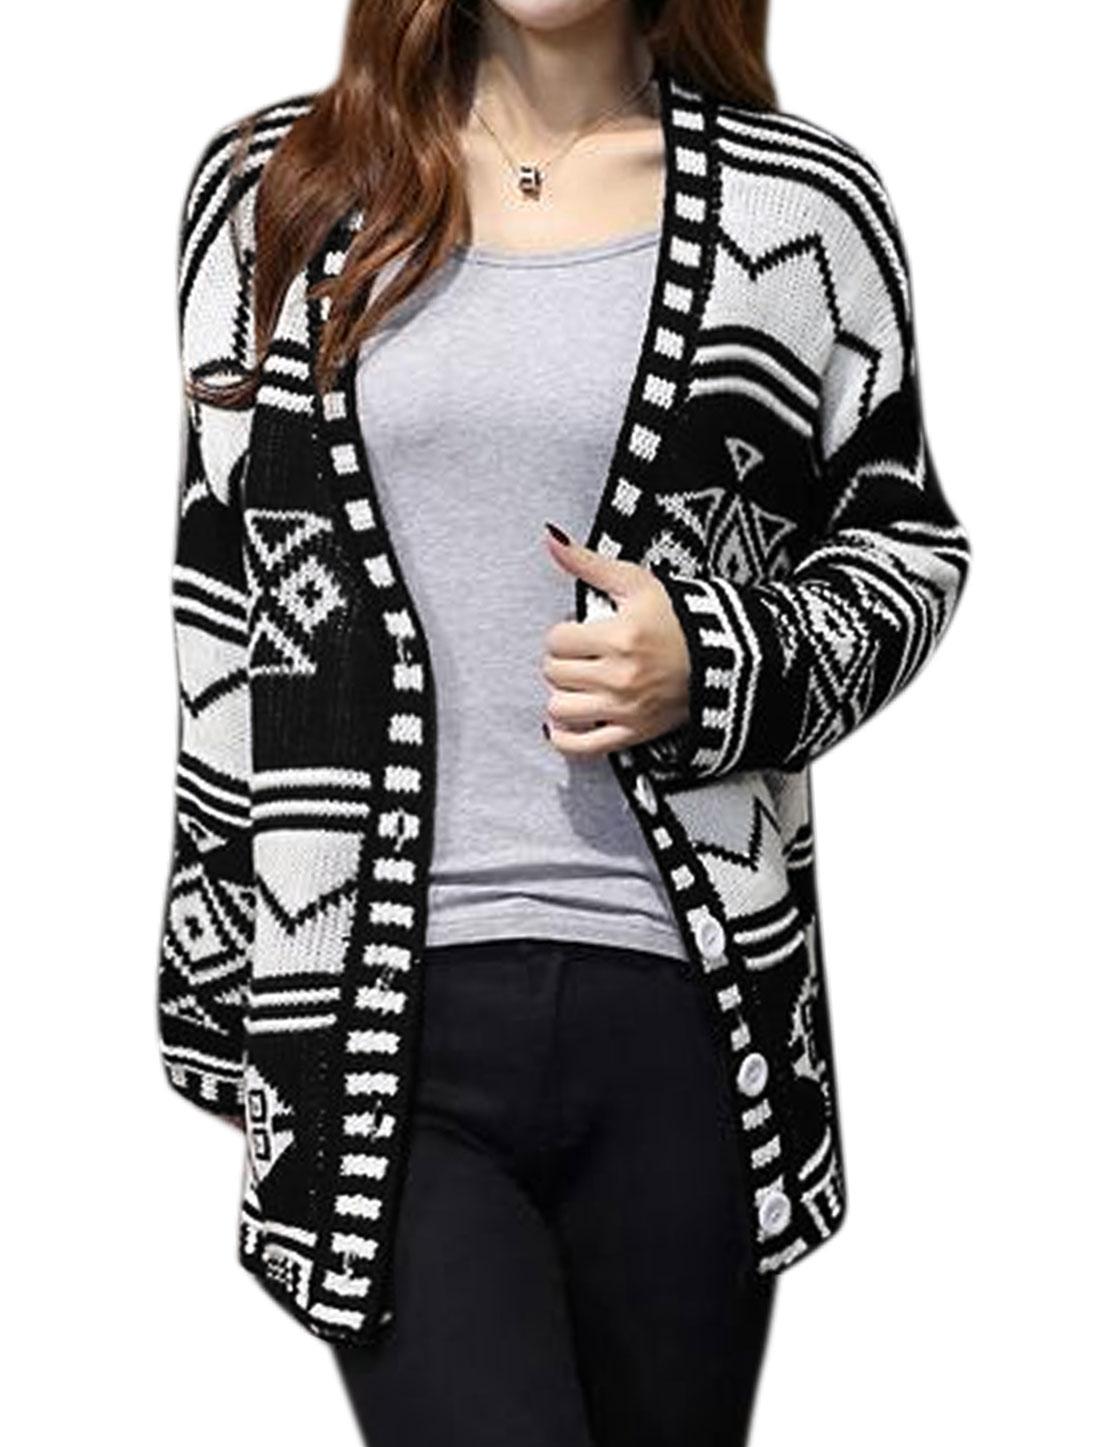 Women Long Sleeve Geometric Prints Tunic Sweater Cardigan Black M